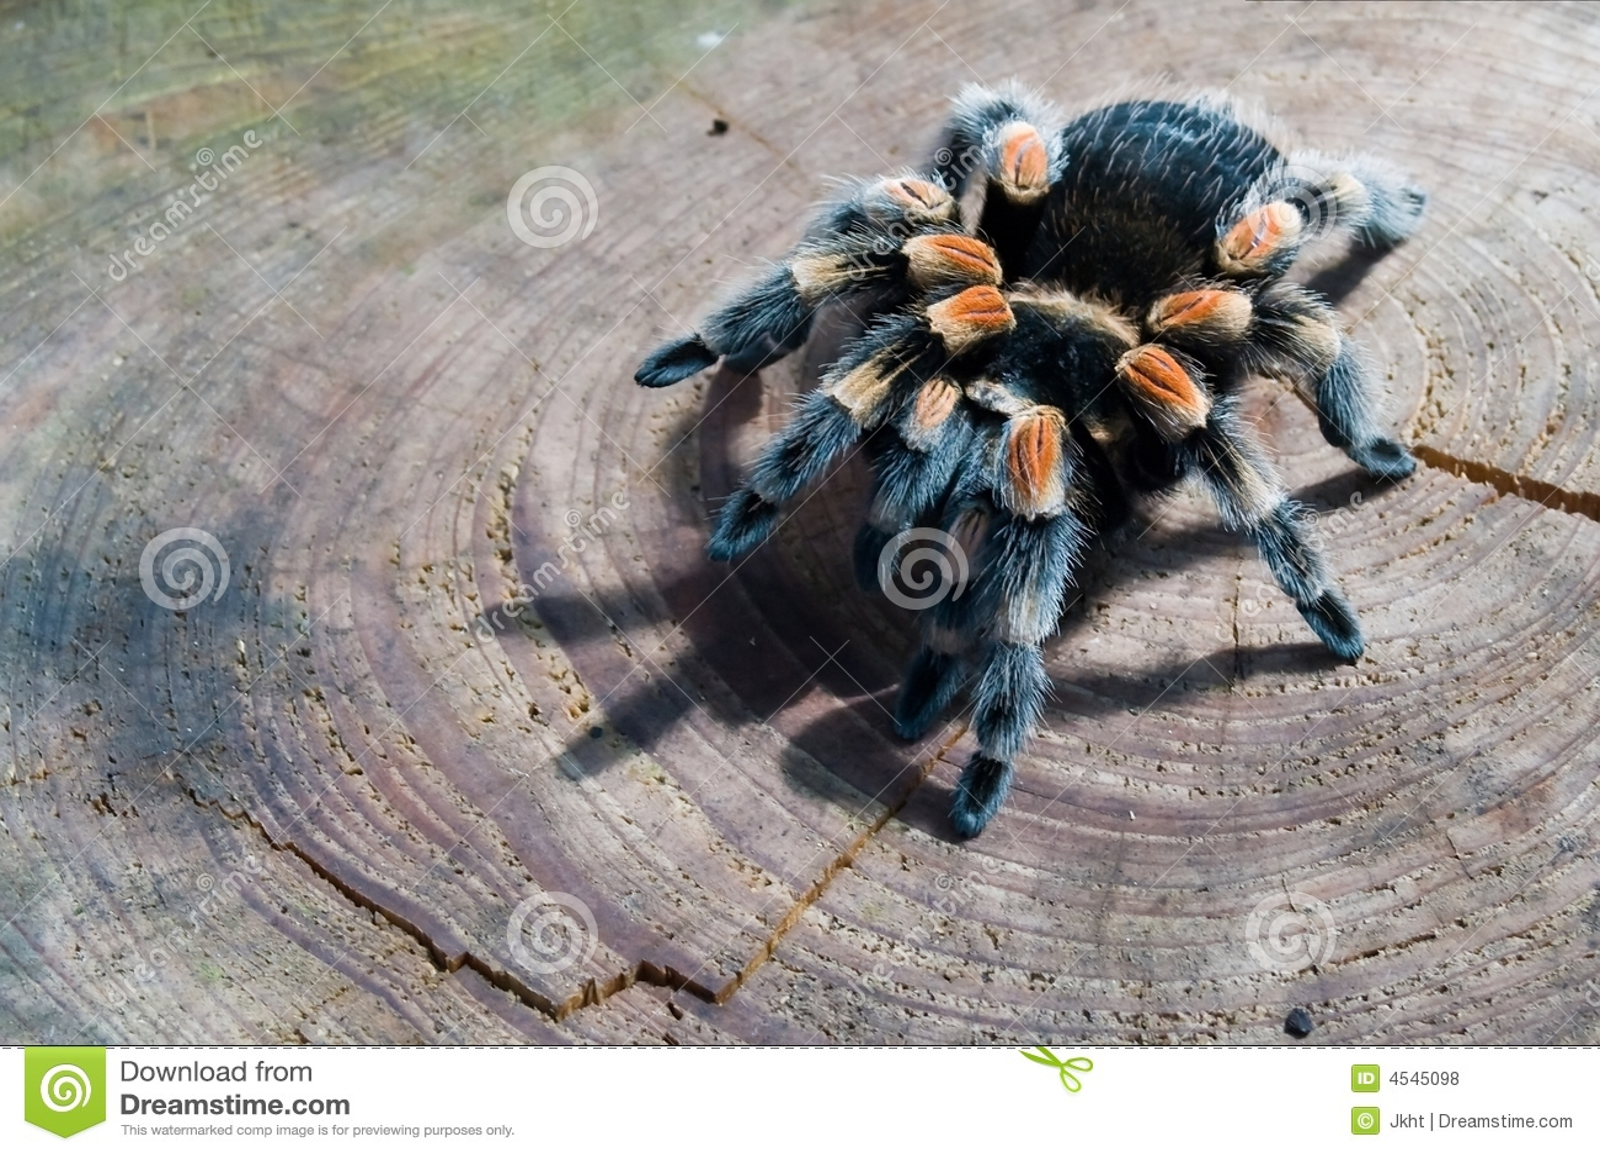 door spider ... & Trap-door Spider Royalty Free Stock Photos - Image: 4545098 Pezcame.Com